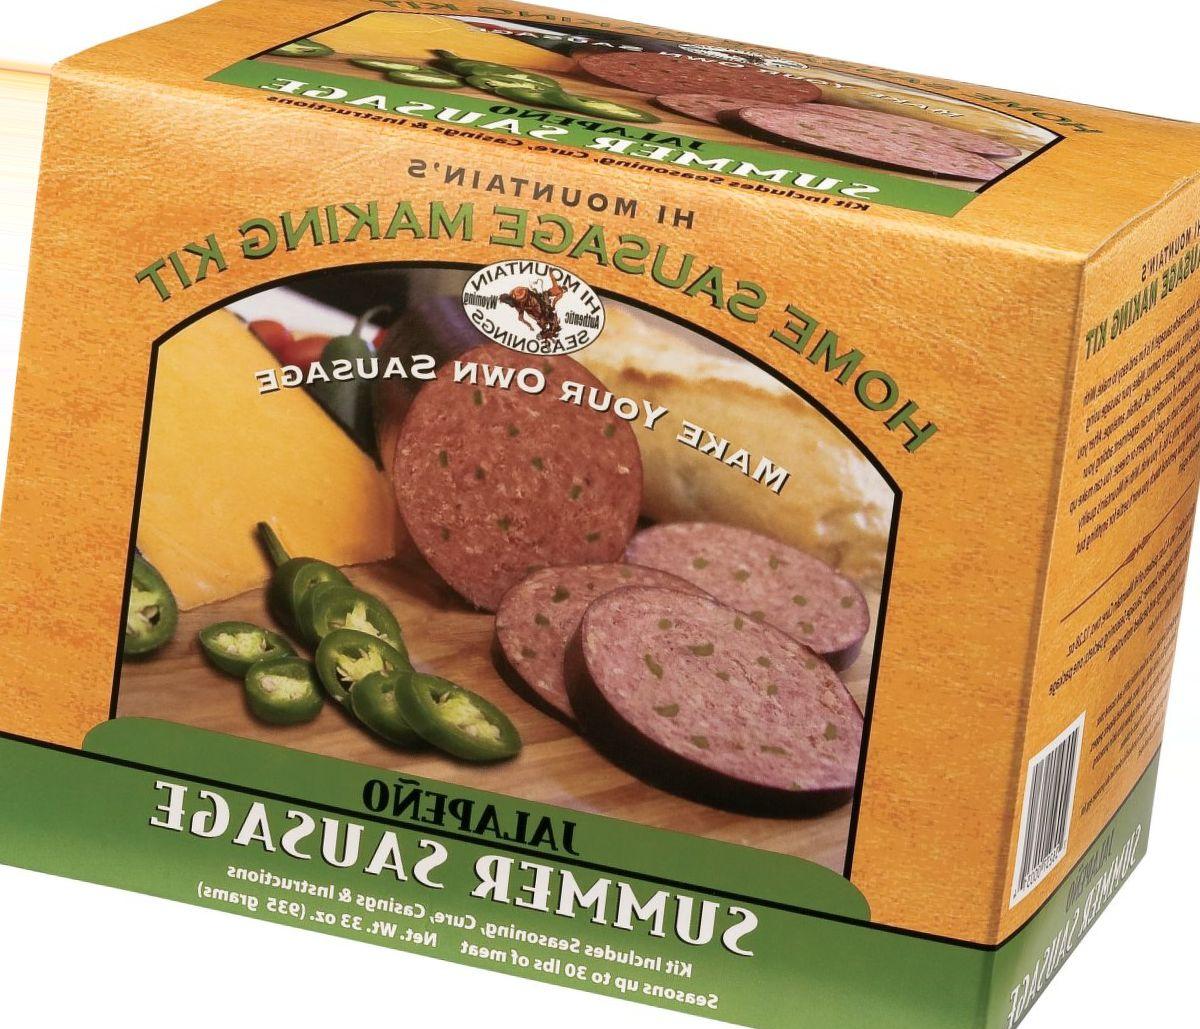 Hi Mountain Home Sausage Kits